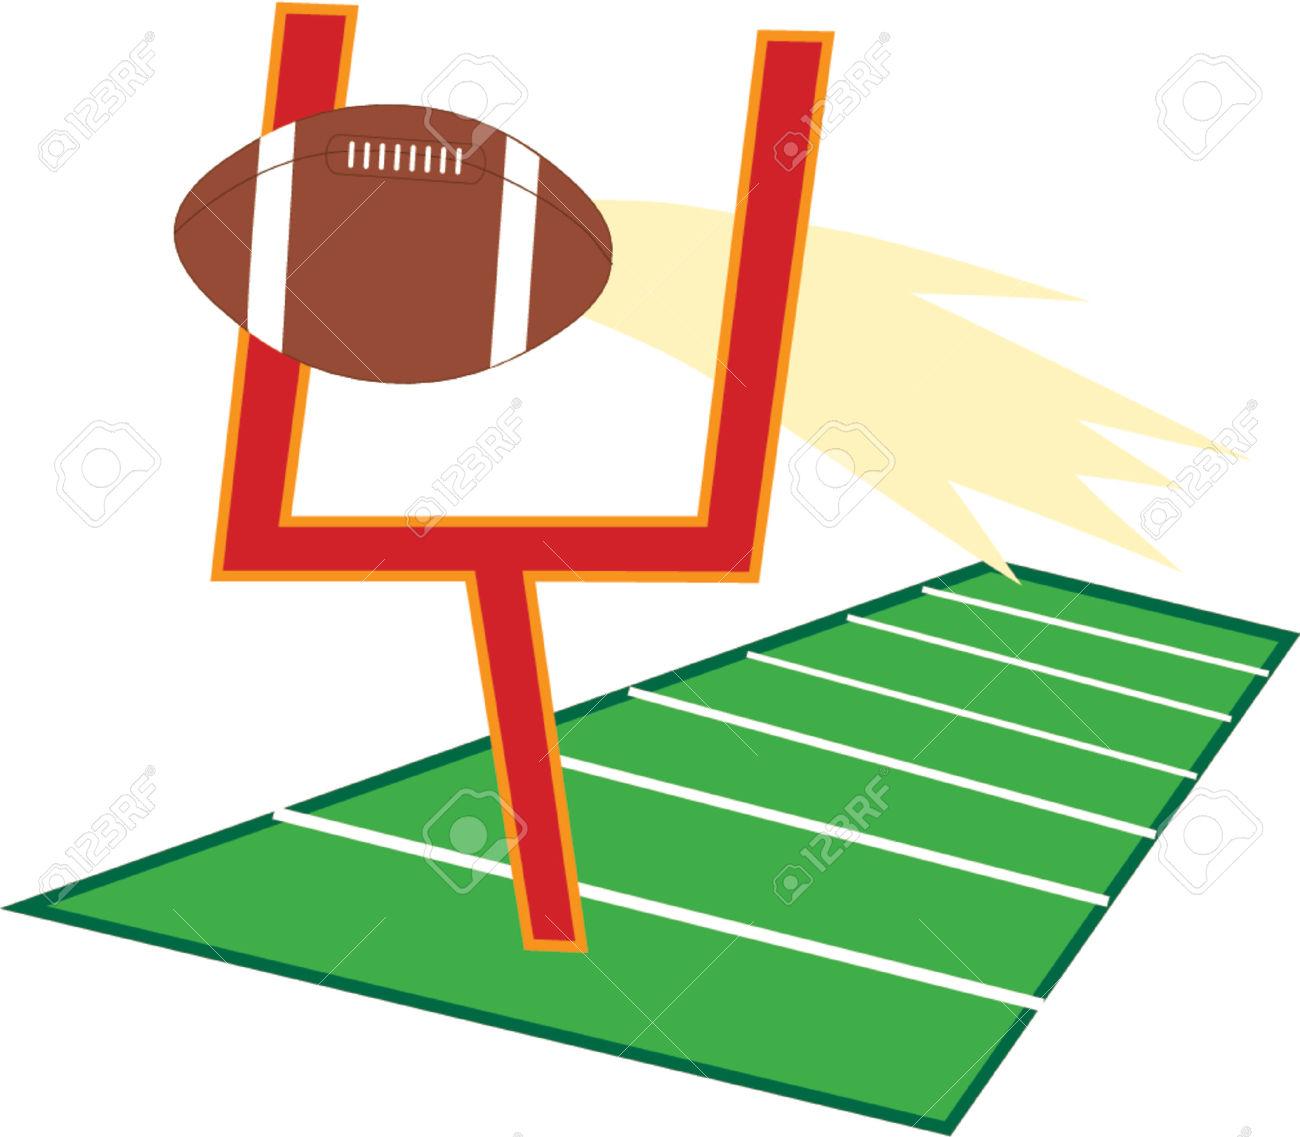 Football Goal Clip Art. A Goalpost On A -Football Goal Clip Art. a goalpost on a football .-12